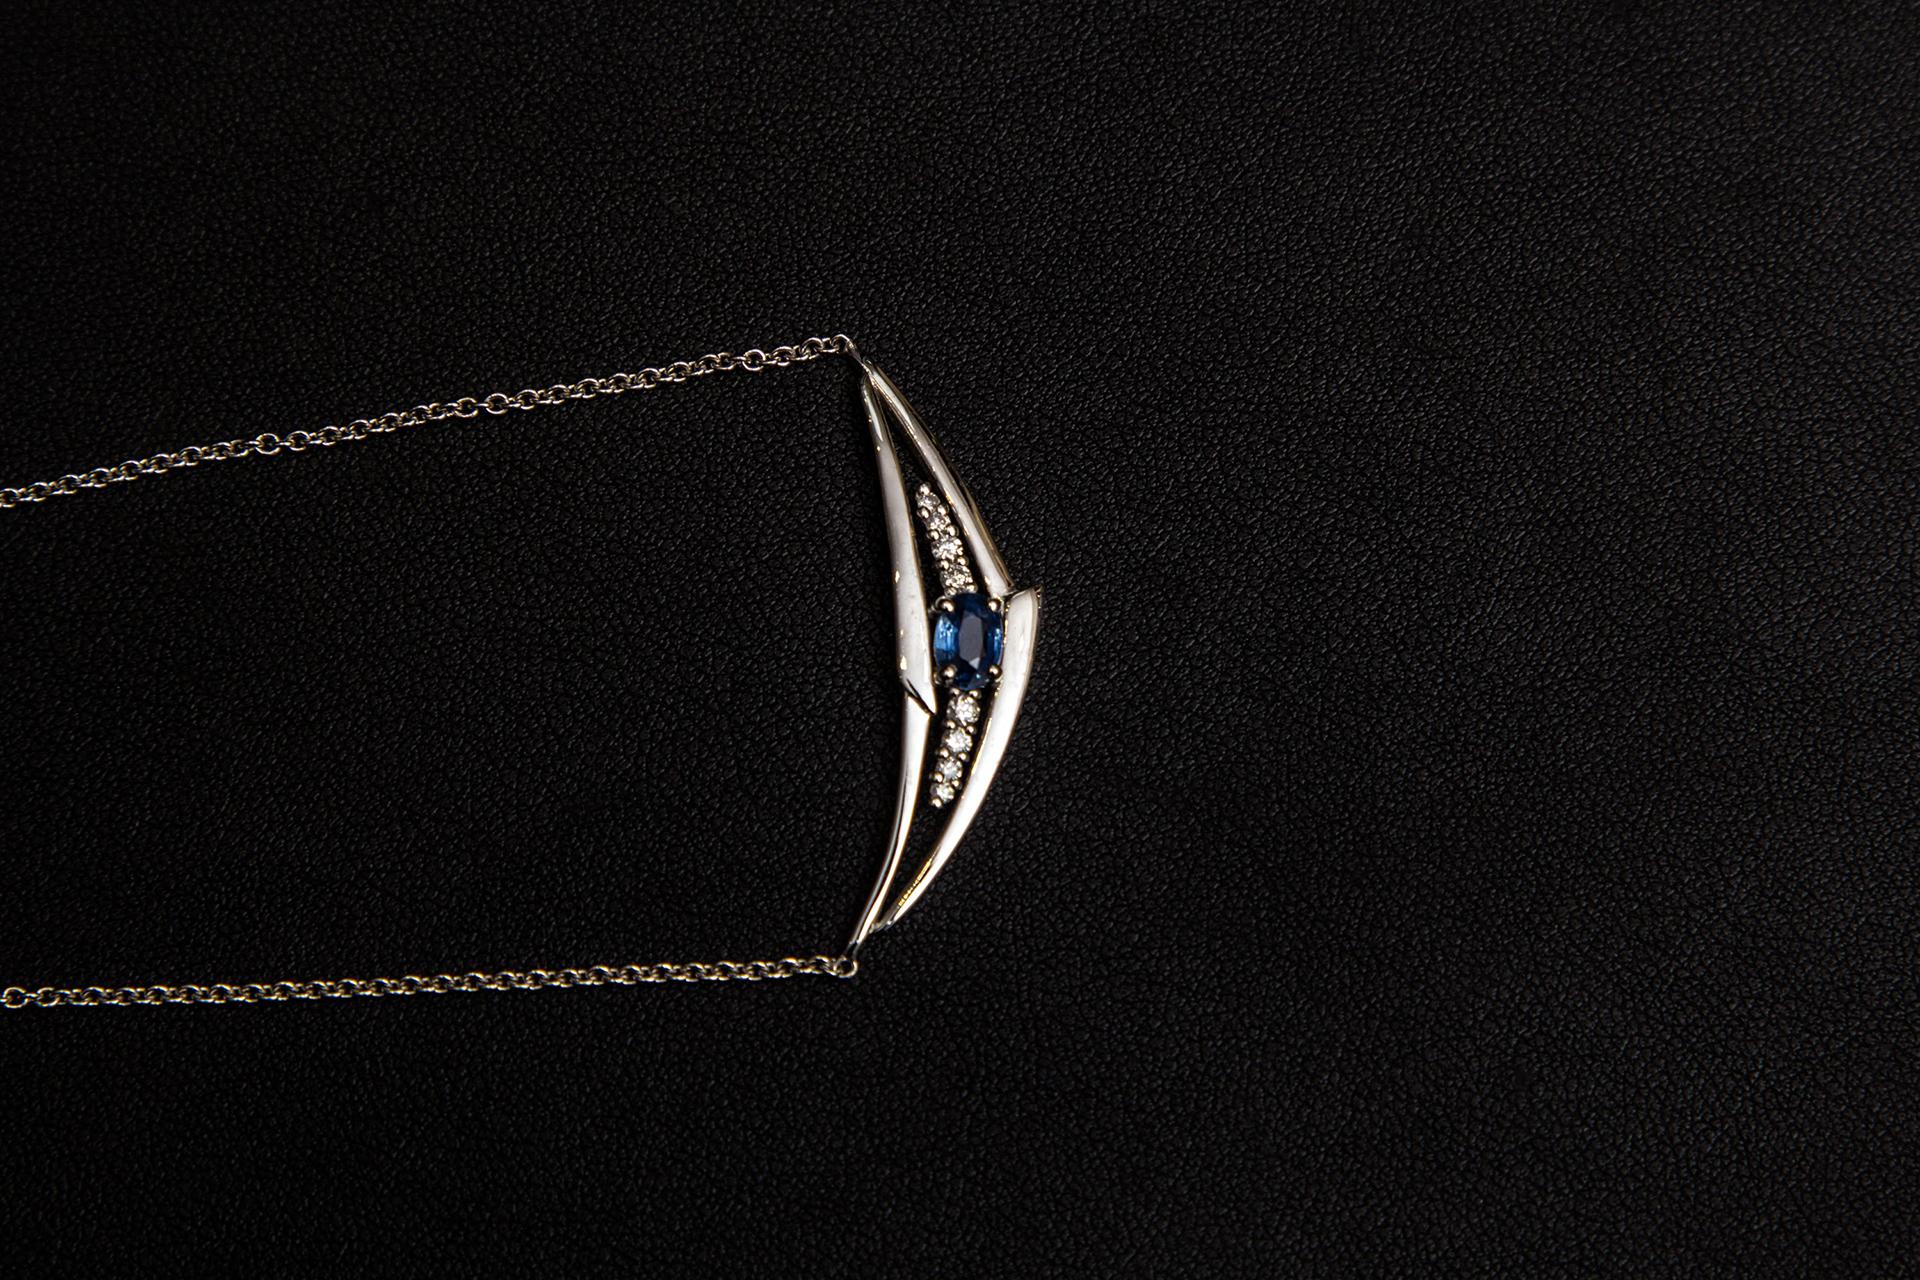 bijouterie-verneau-collier-or-diamand-saphir-cadeau-artisan-bijoutier-qualite